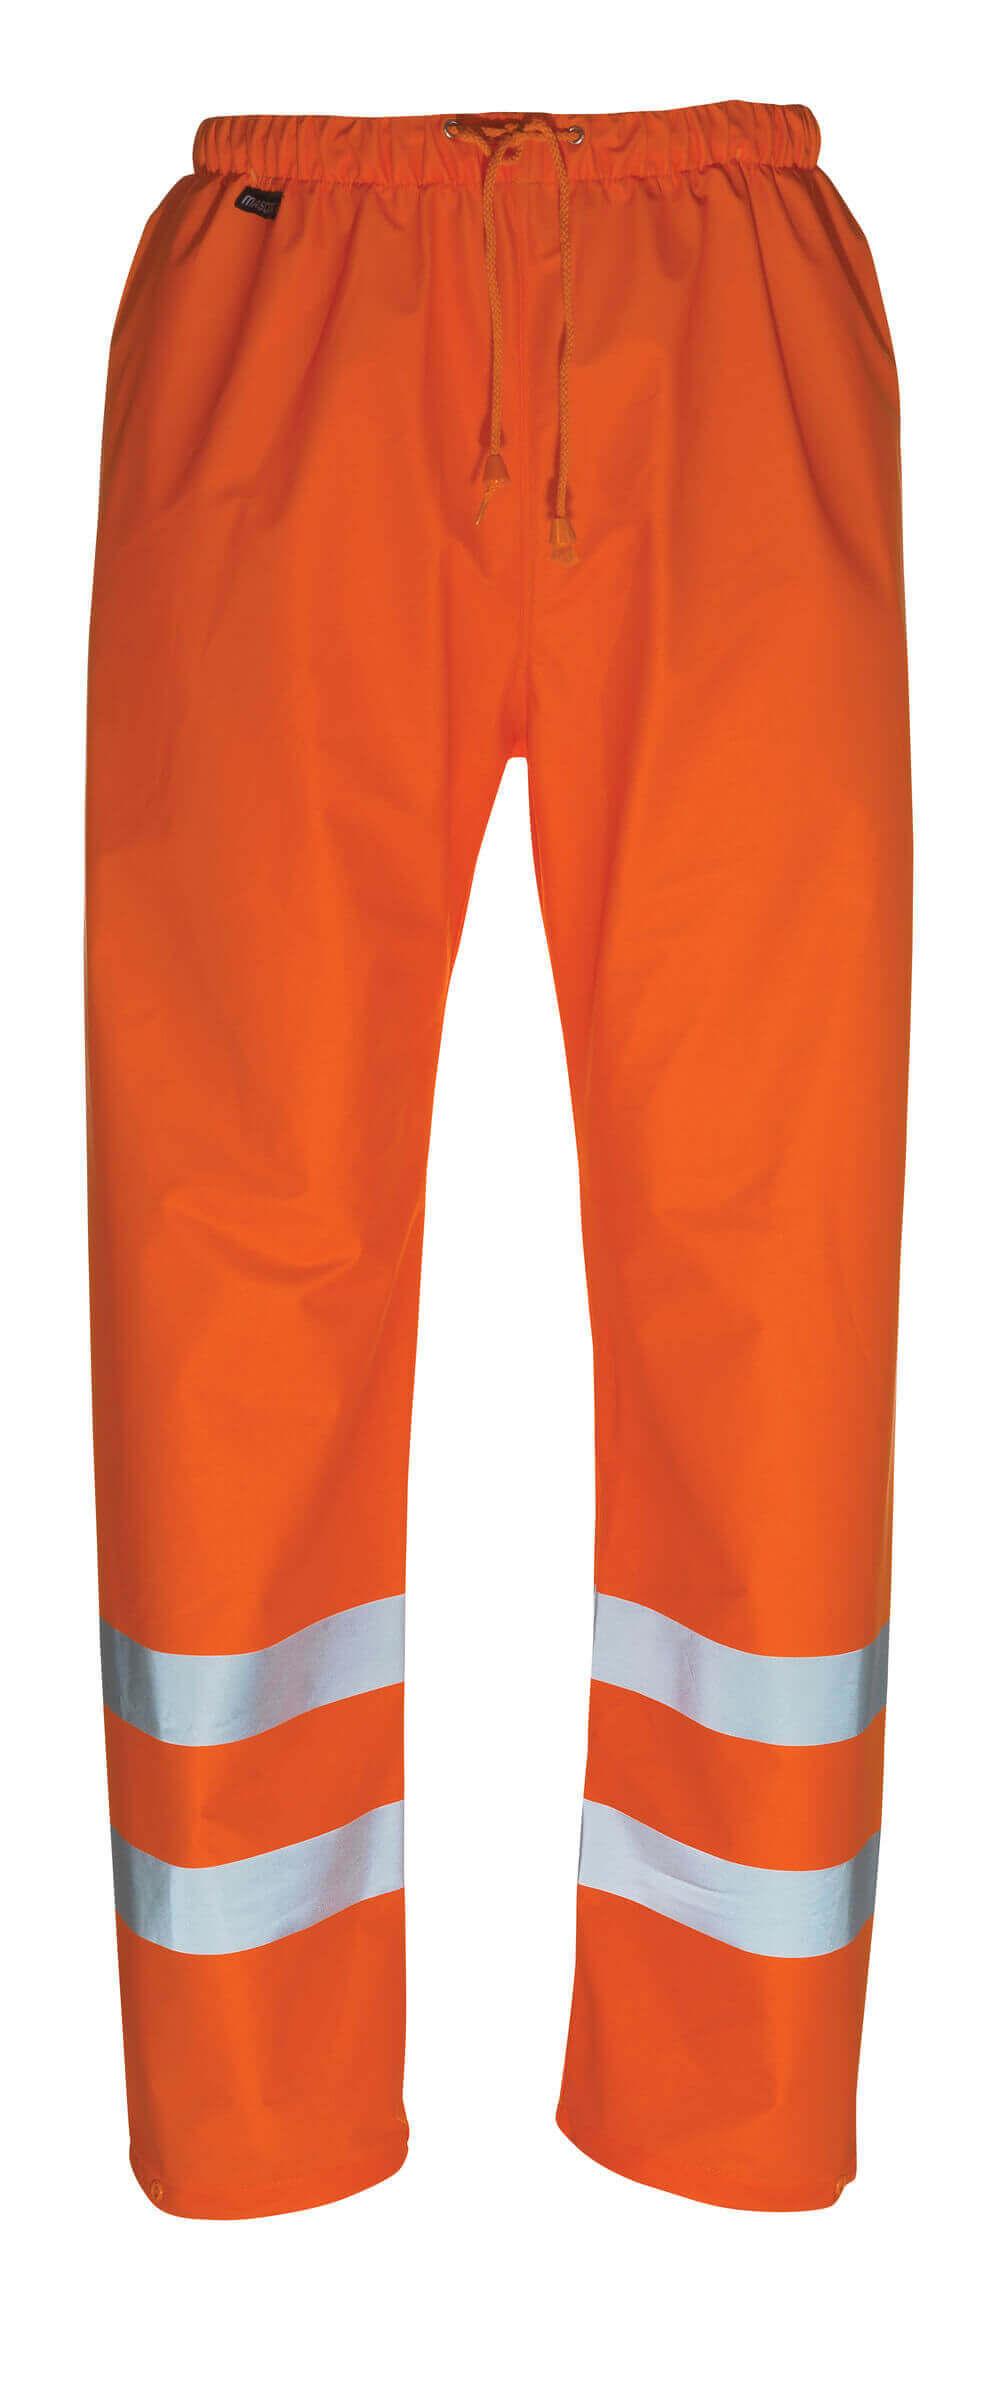 50102-814-14 Regnbyxor - hi-vis orange